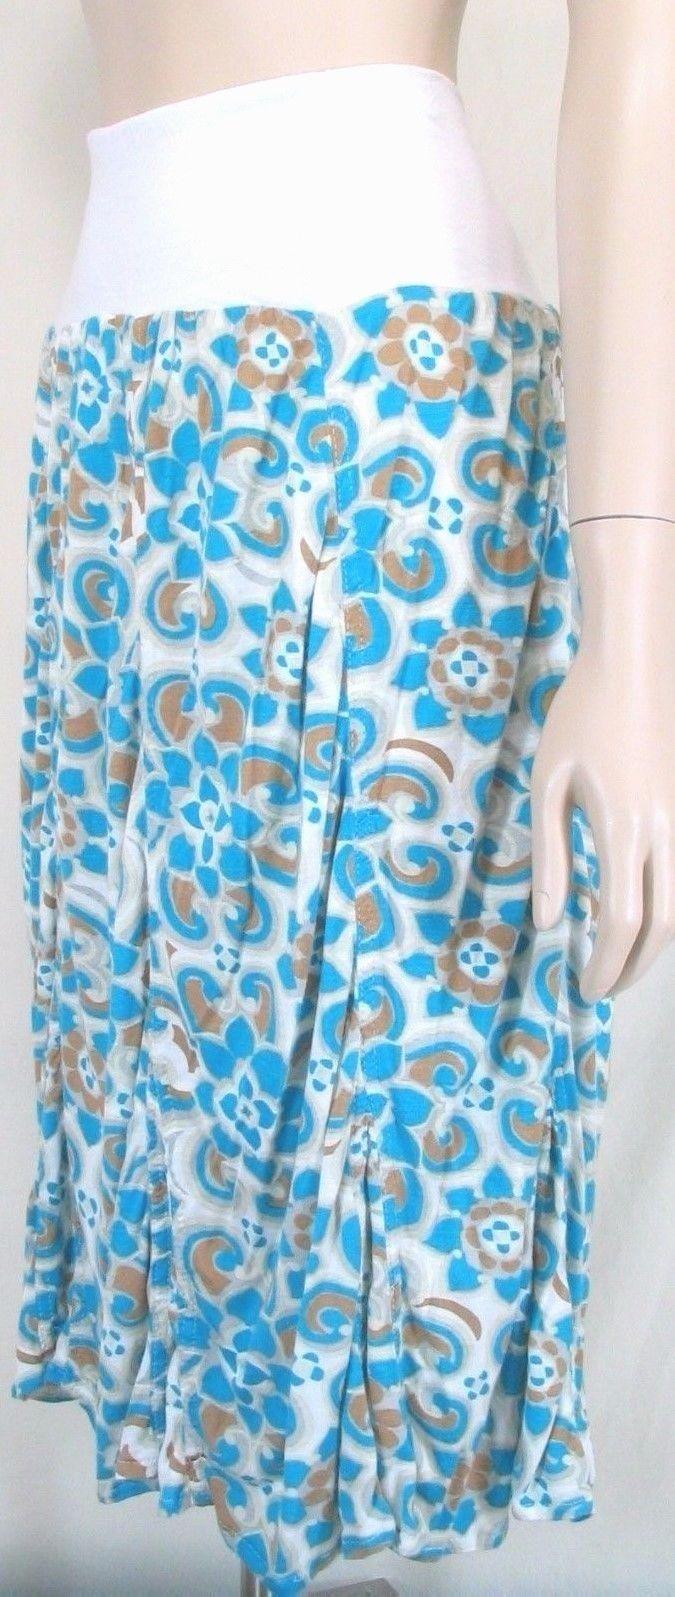 Surrealist skirt NWT M foldover waist ruched bottom white turquoise gold USA new